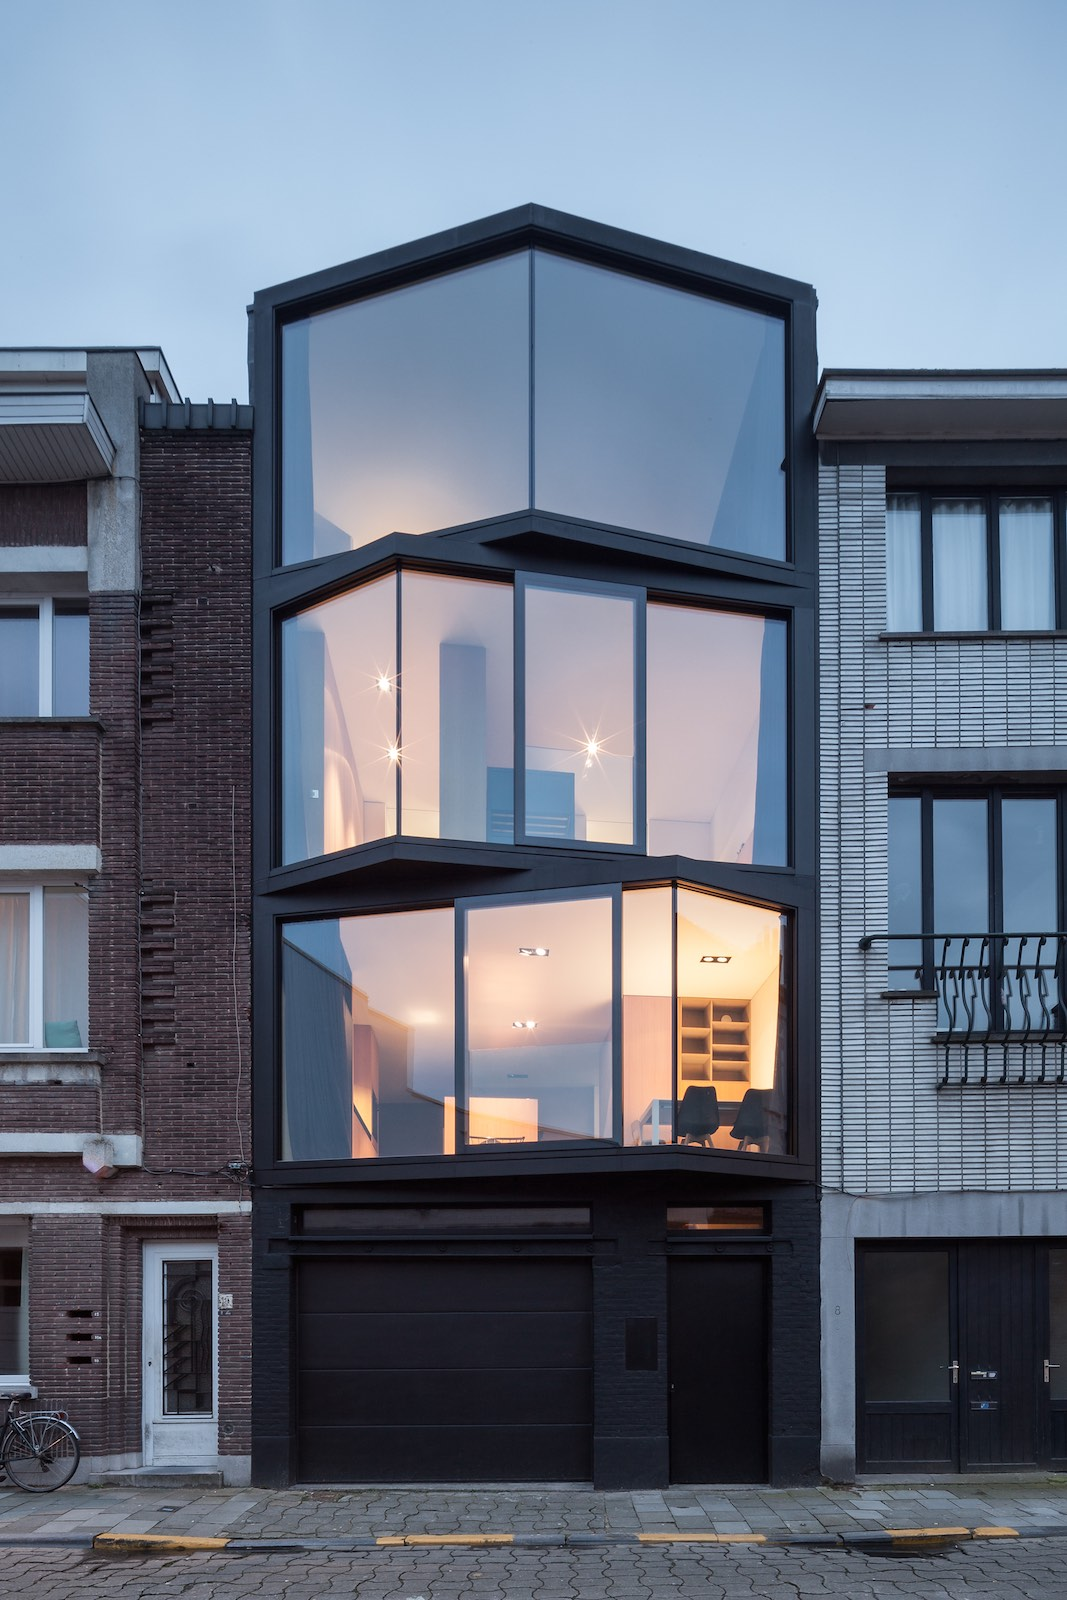 Abeel House By Steven Vandenborre Miass Architectuur